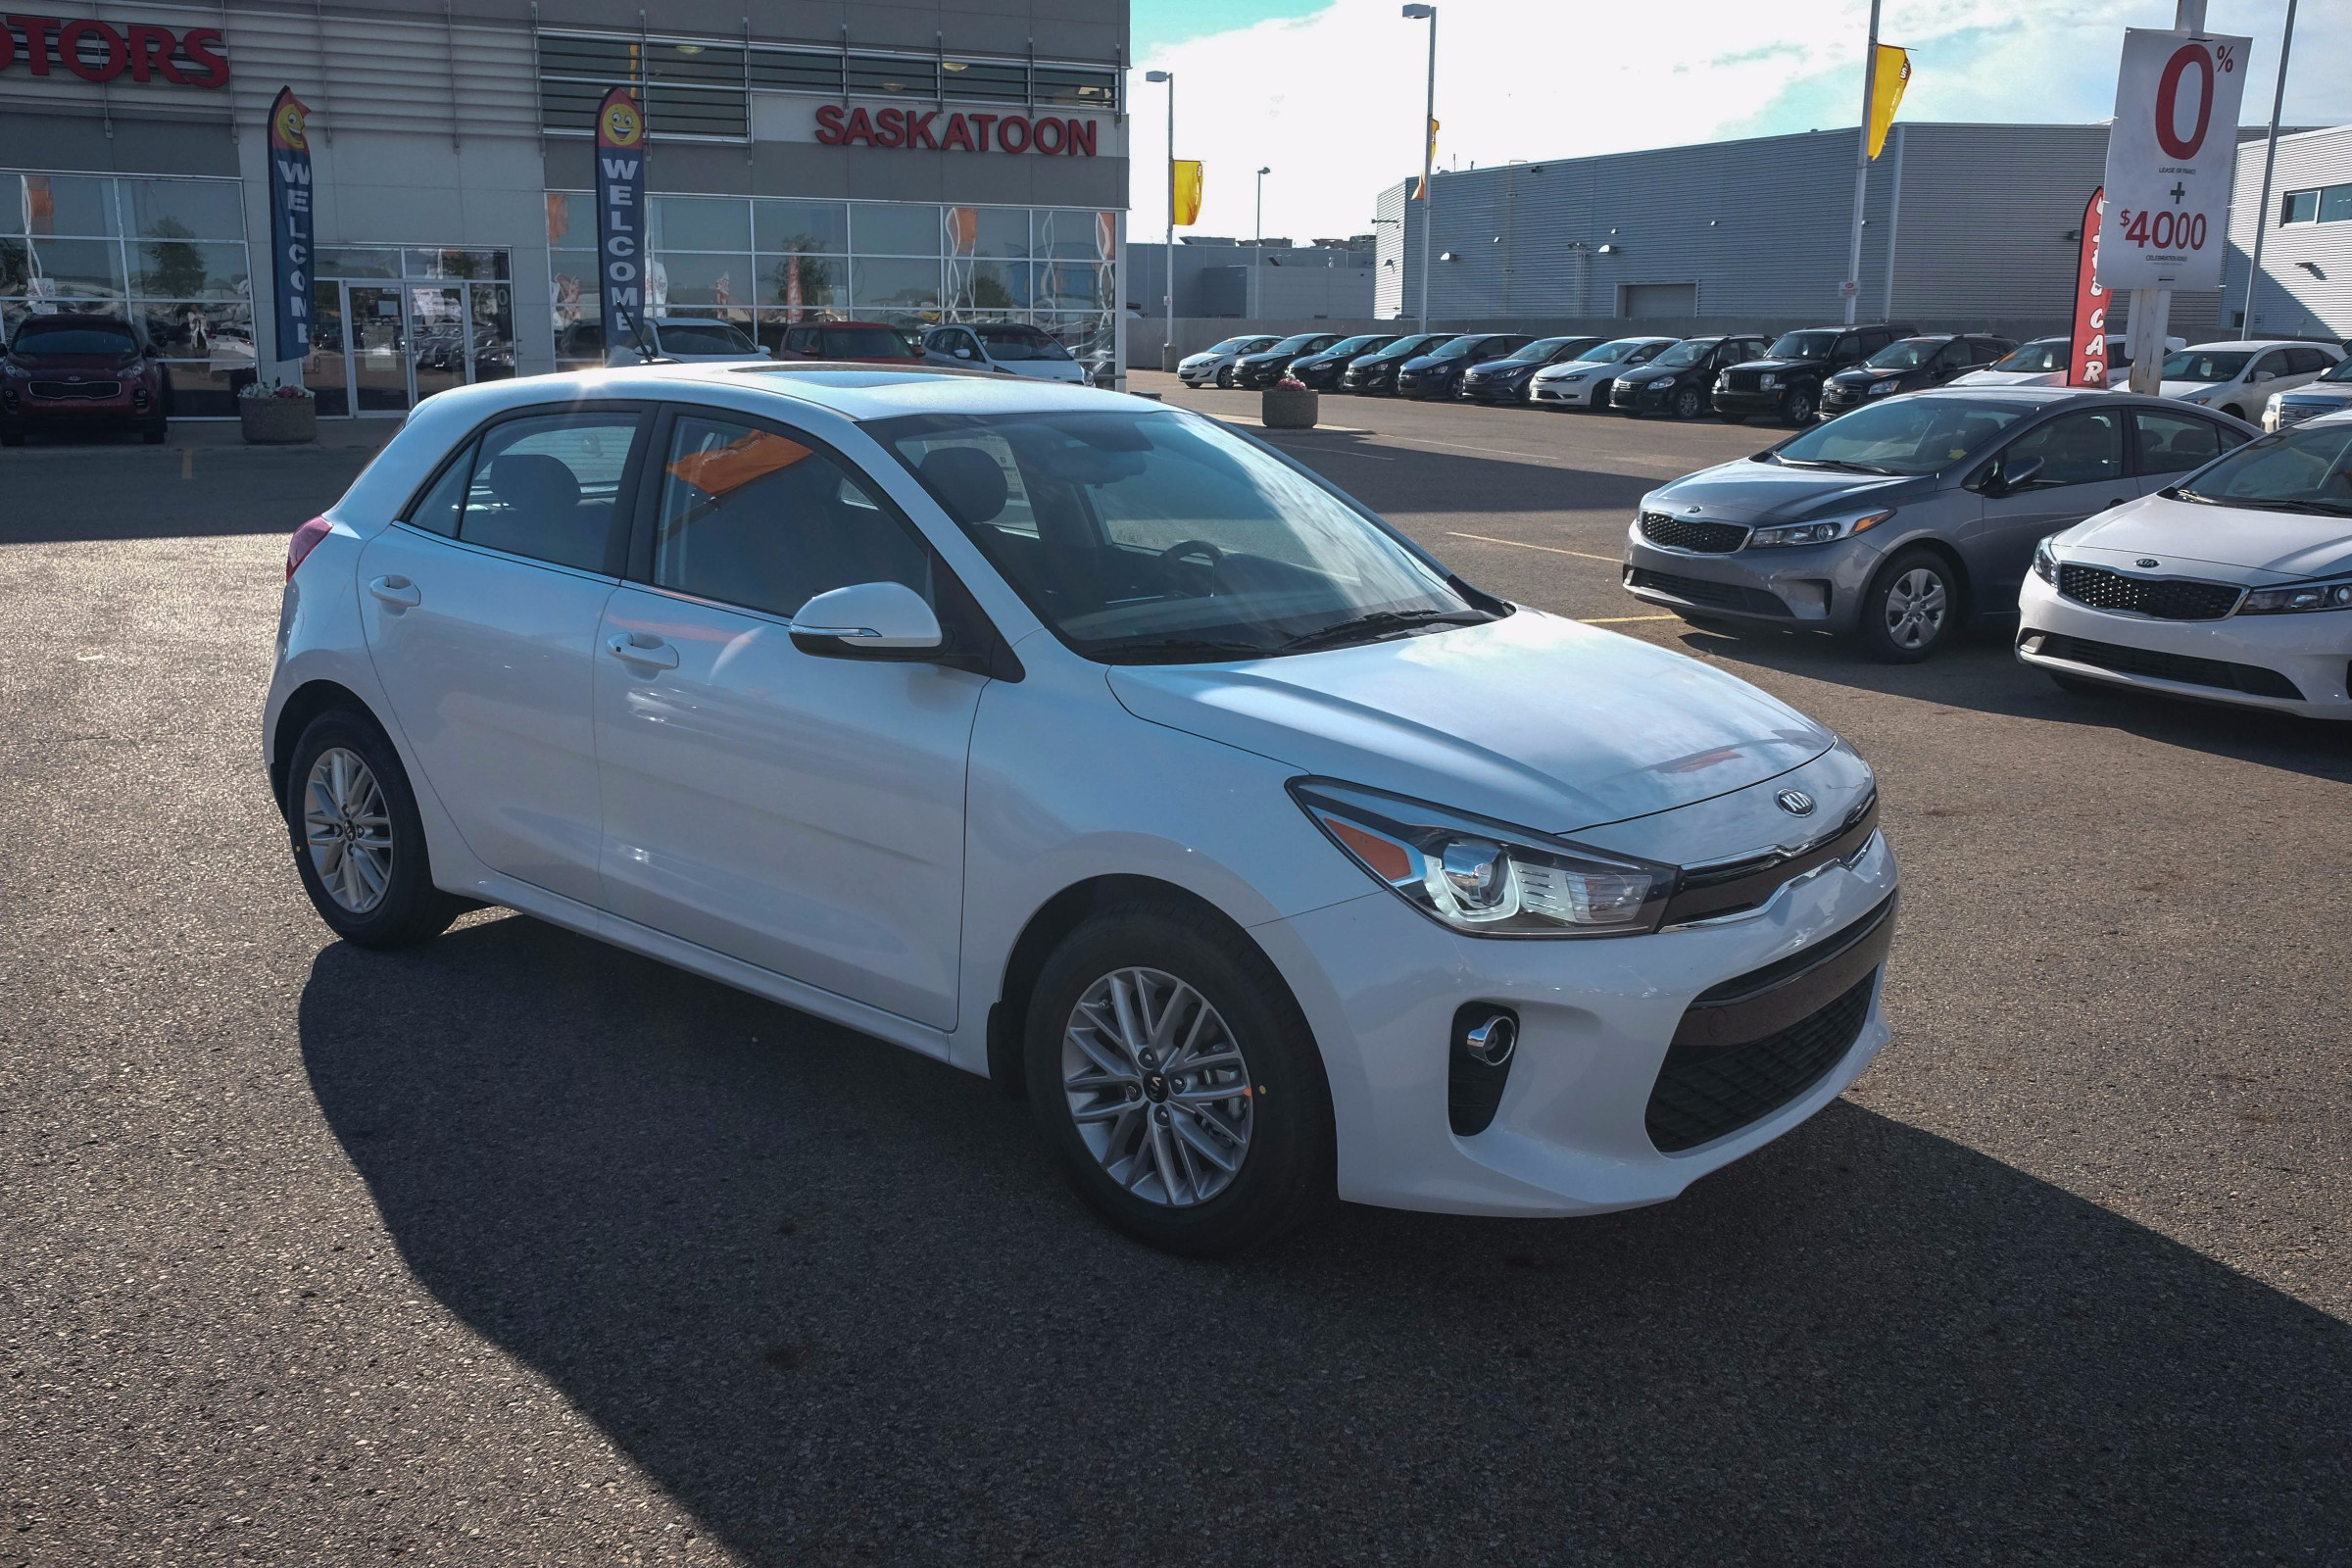 Used Cars Saskatchewan: 2017 Kia Rio5 For Sale In Saskatoon, SK